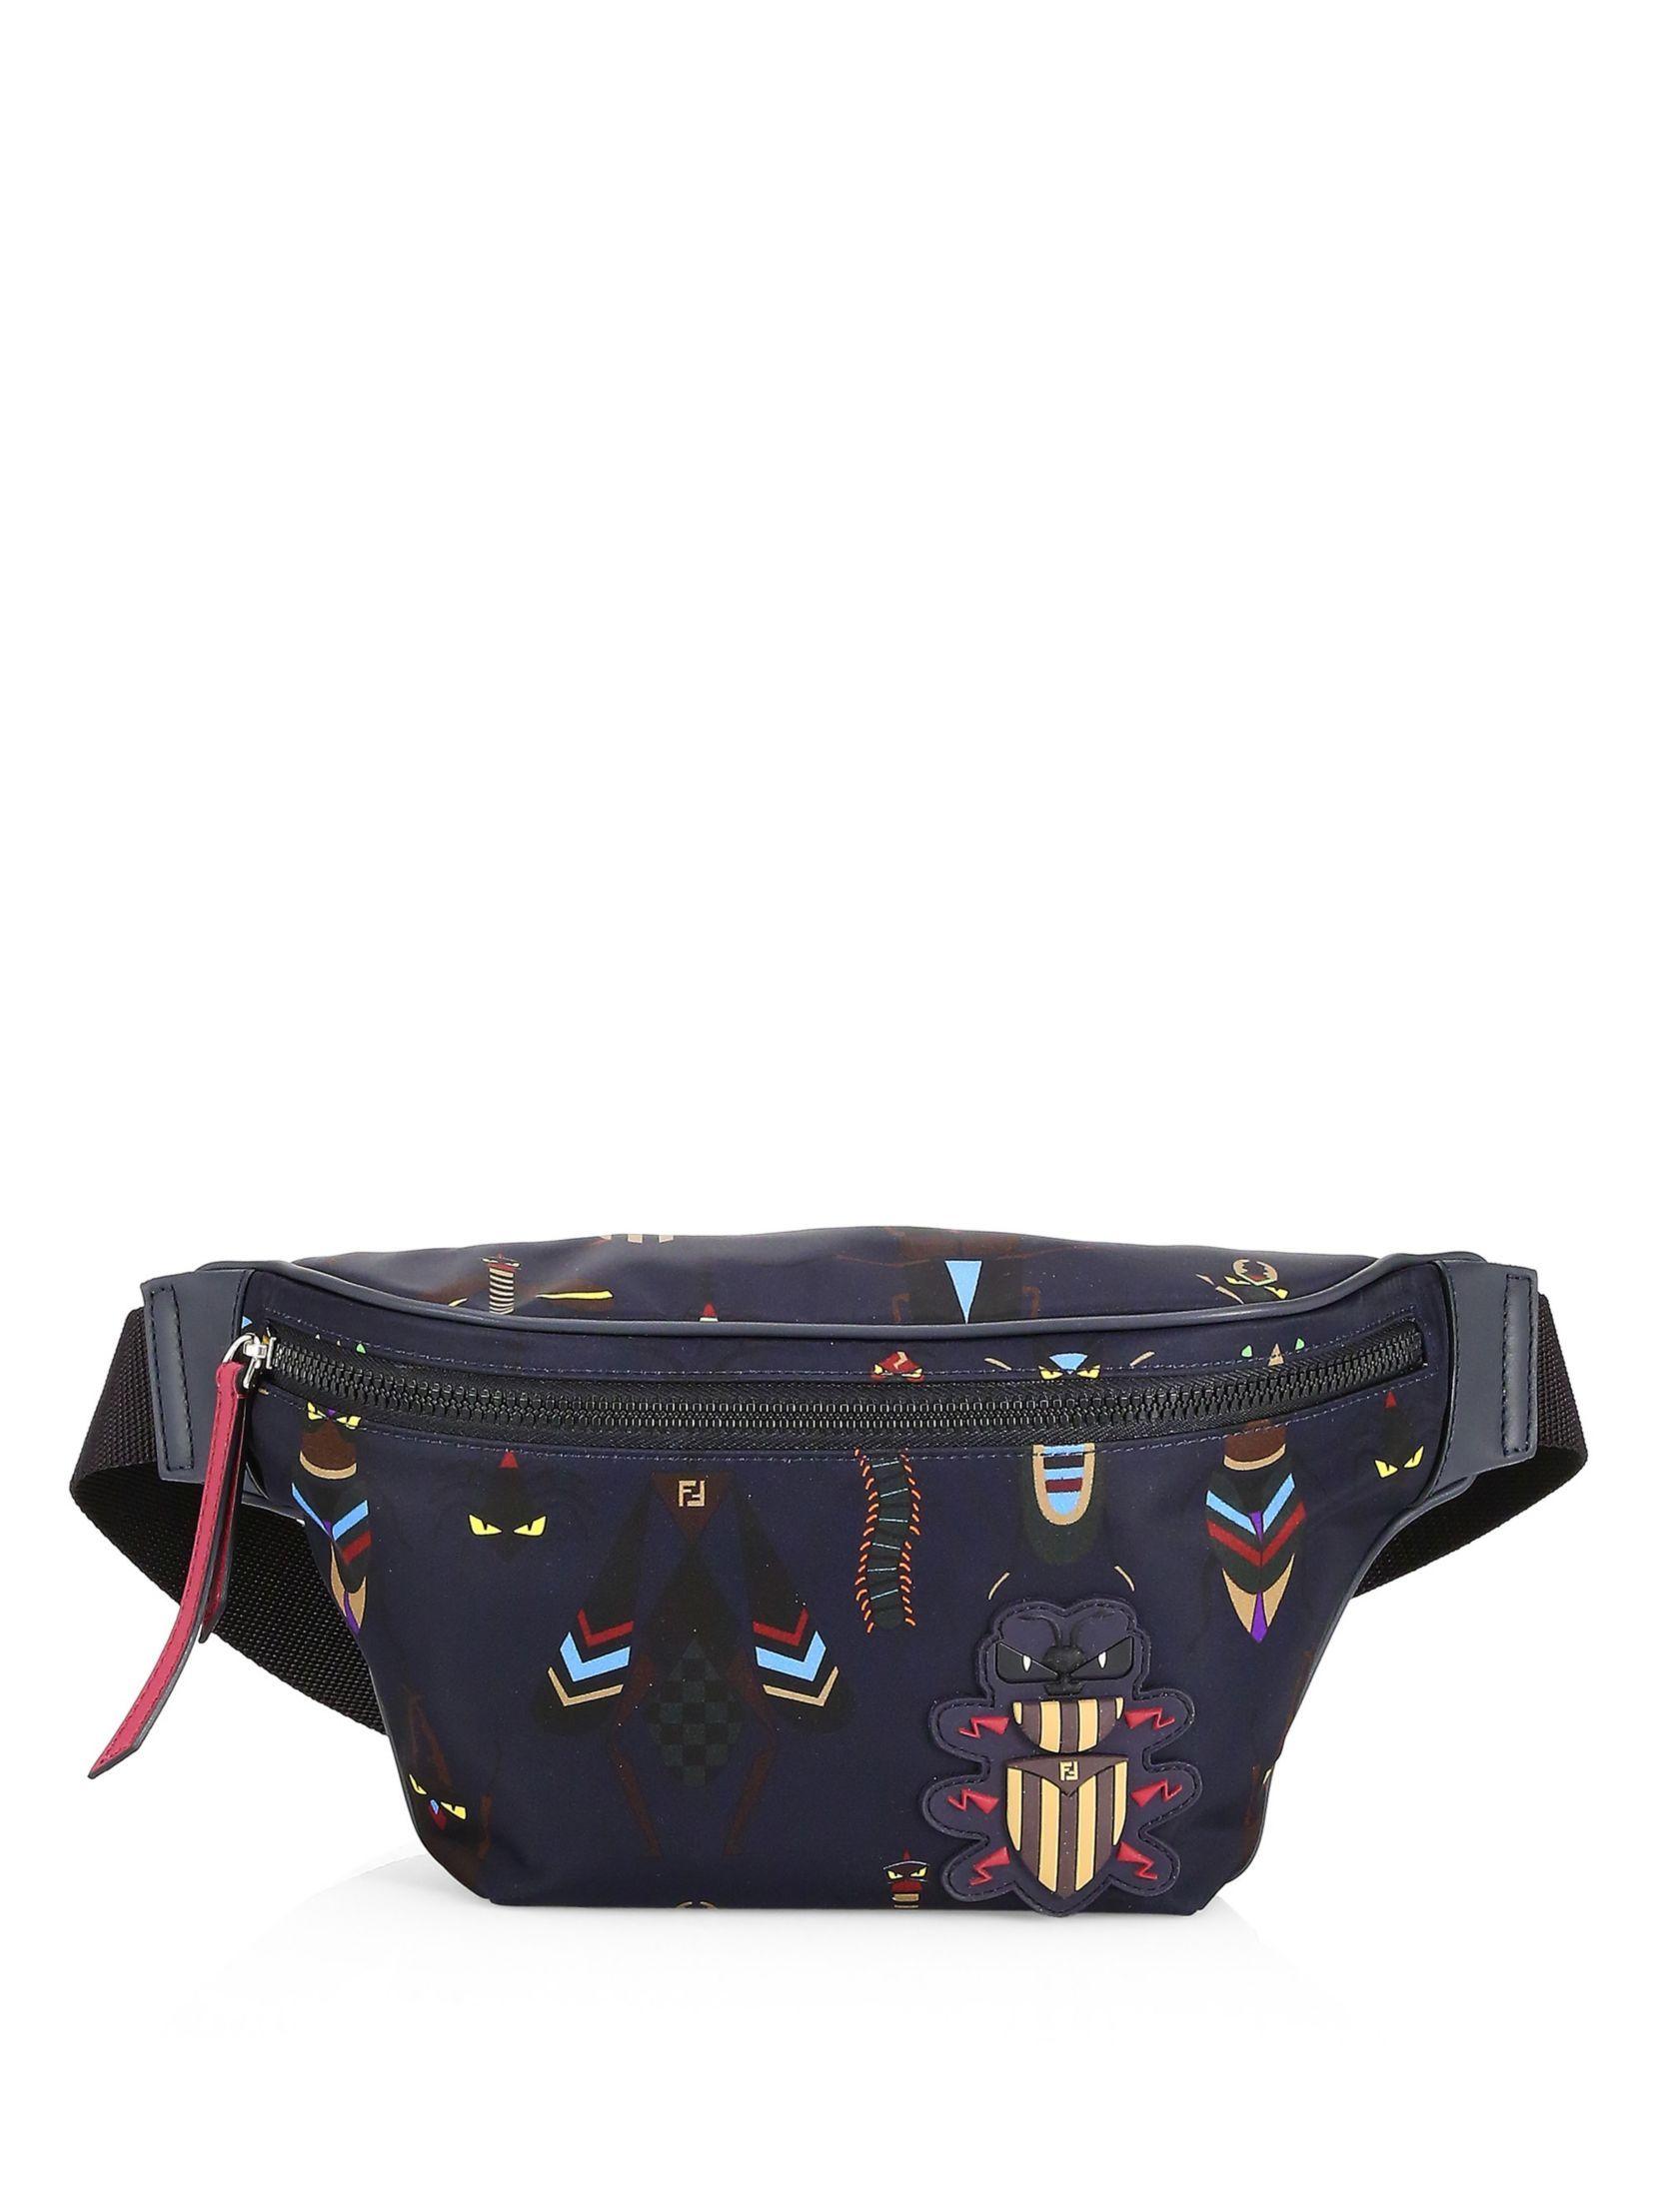 Fendi Embellished Nylon Belt Bag  73dc658e093a1